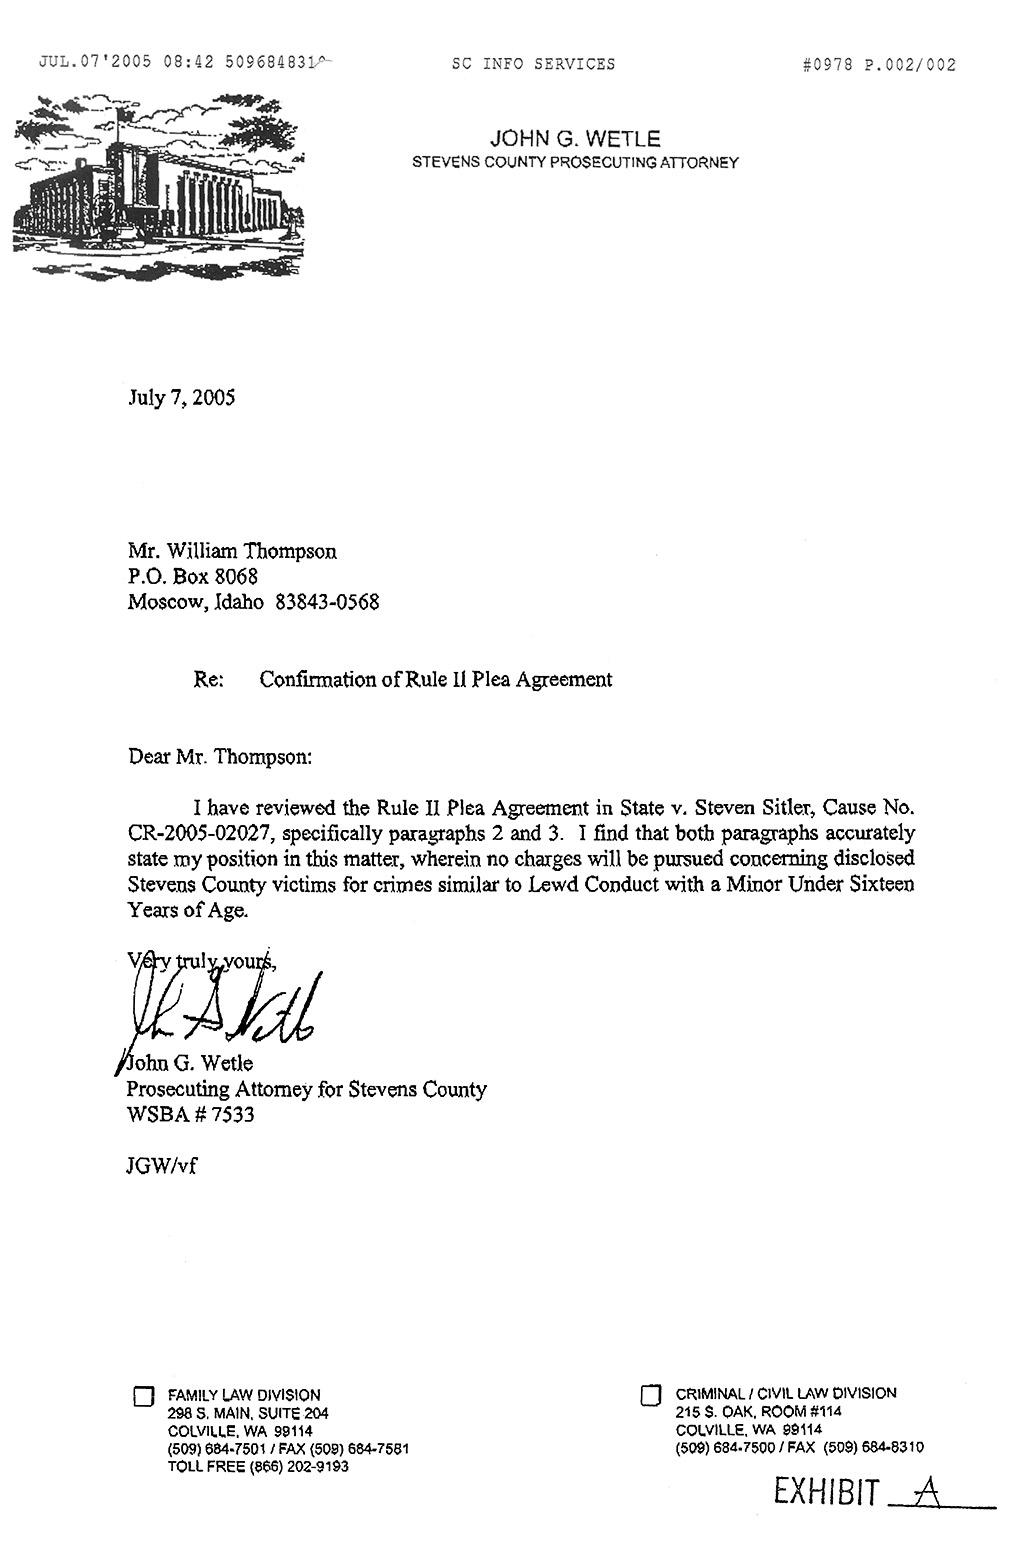 Confirmation of Rule II Plea Agreement